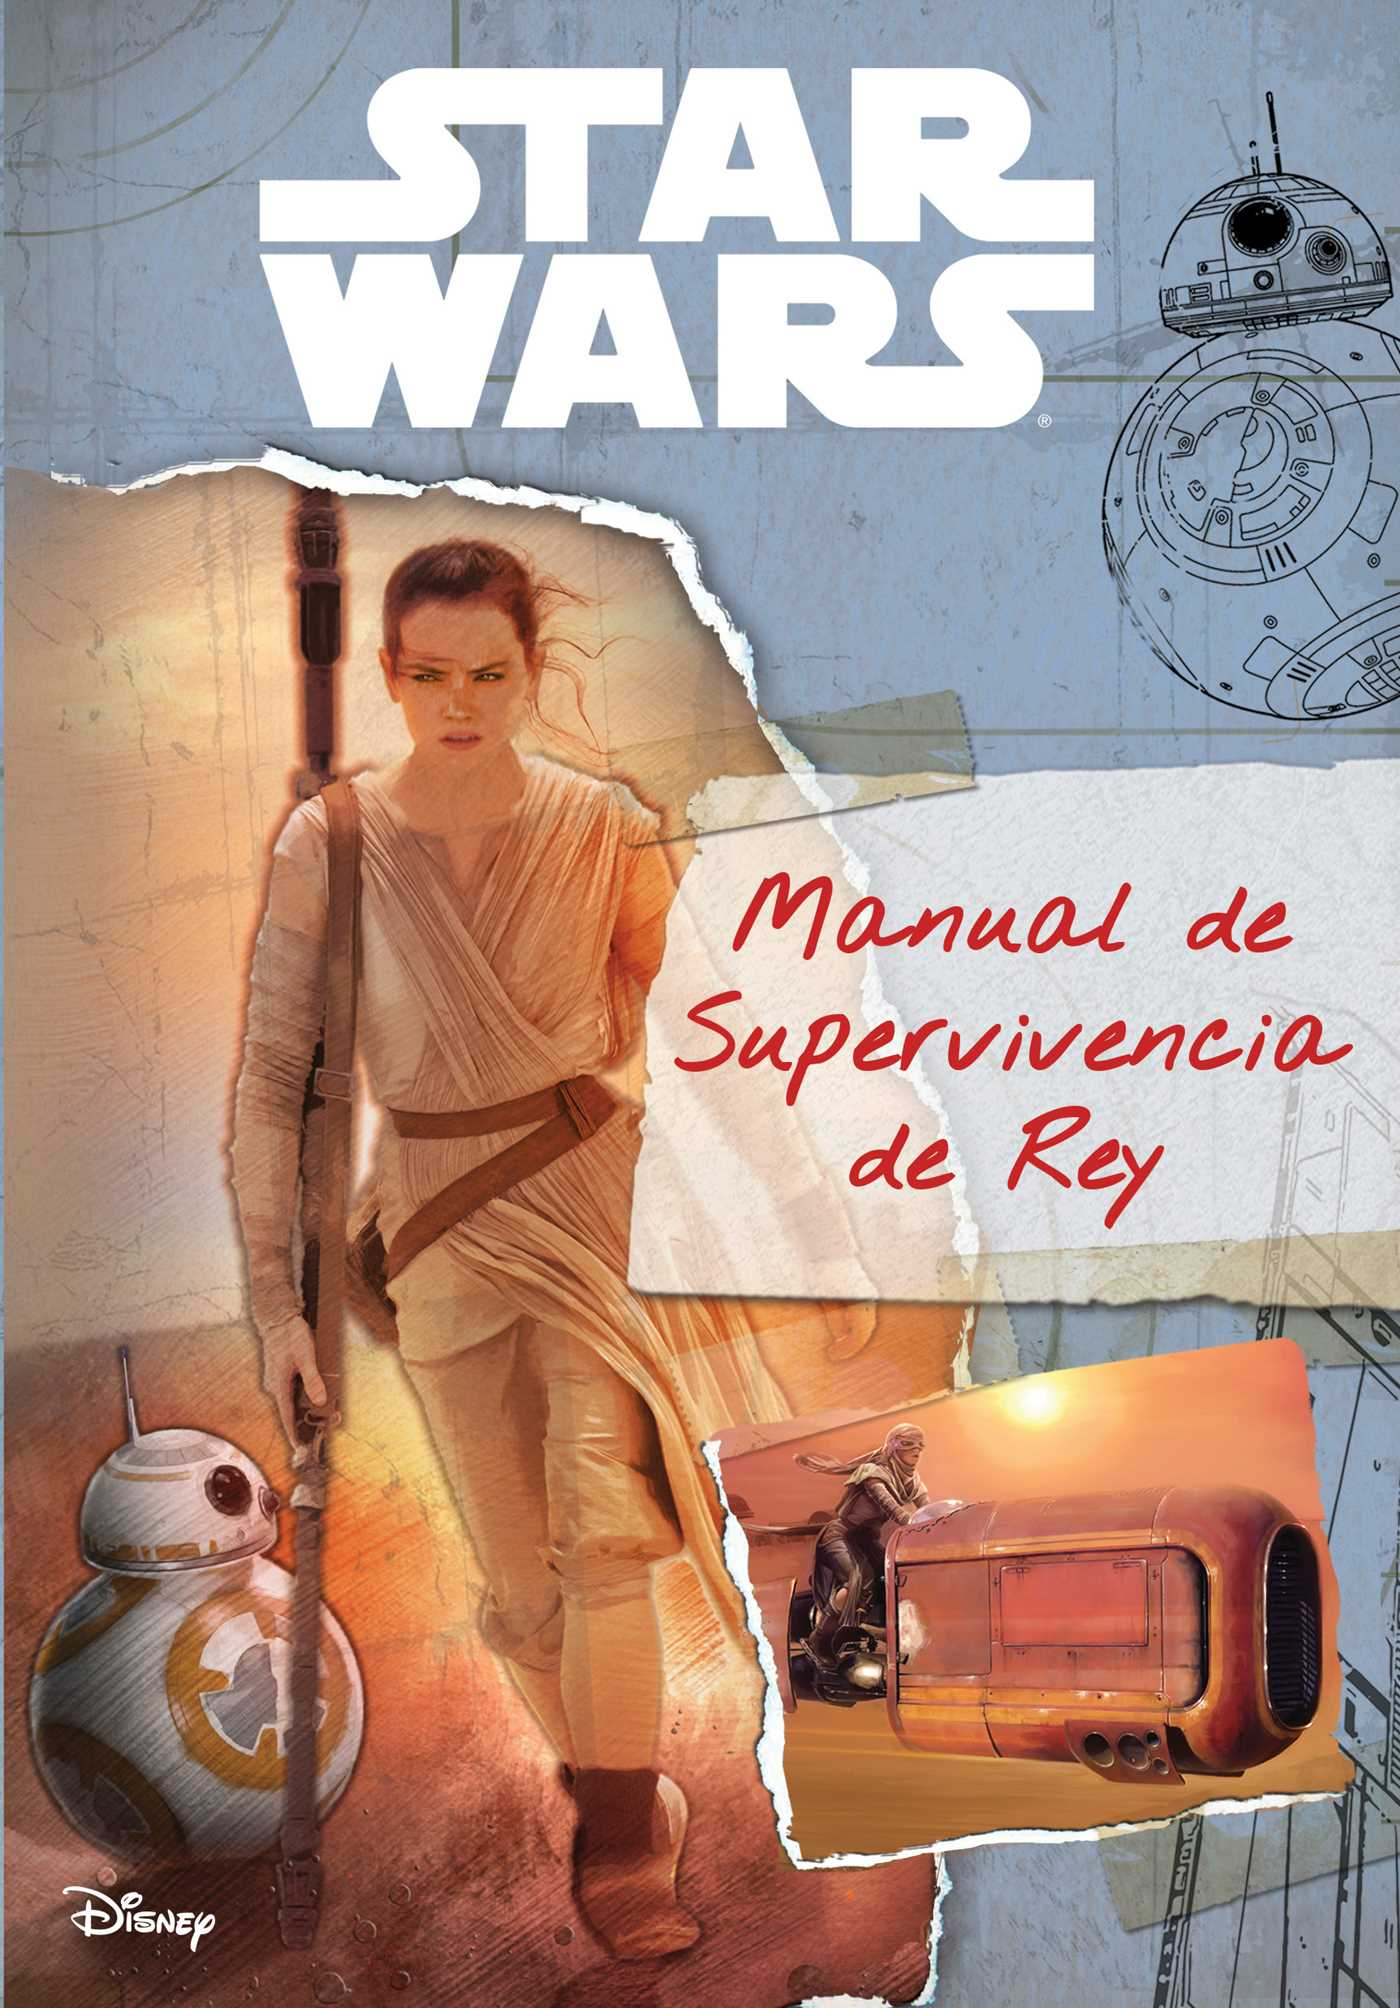 Star wars the force awakens manual de supervivencia de rey 9781684122431 hr